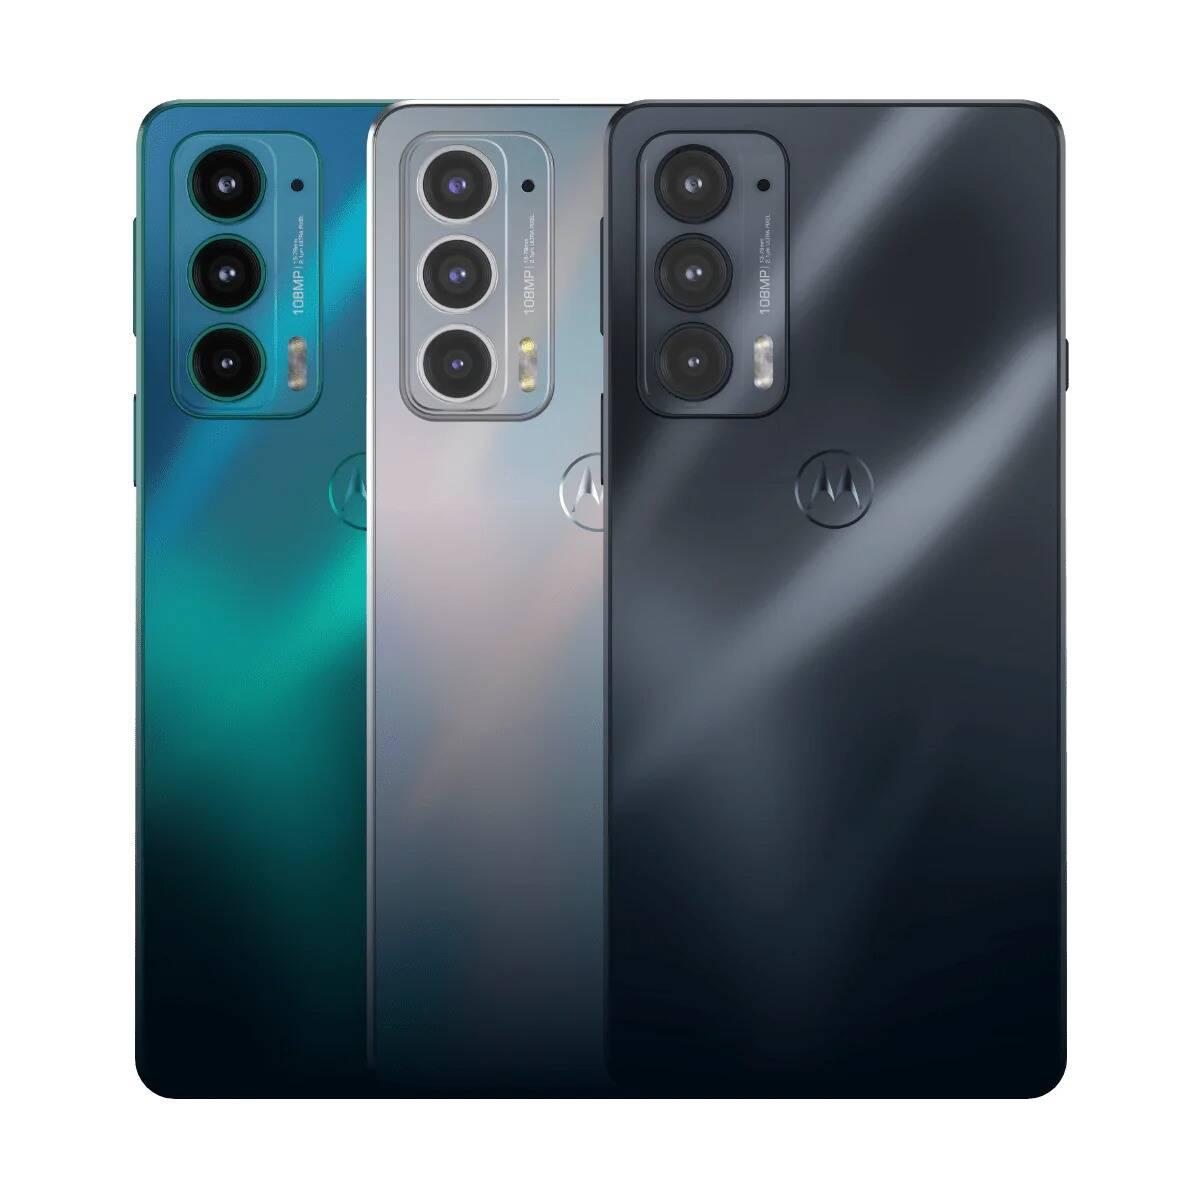 Motorola edge 20 Pro, edge 20 e edge 20 Lite